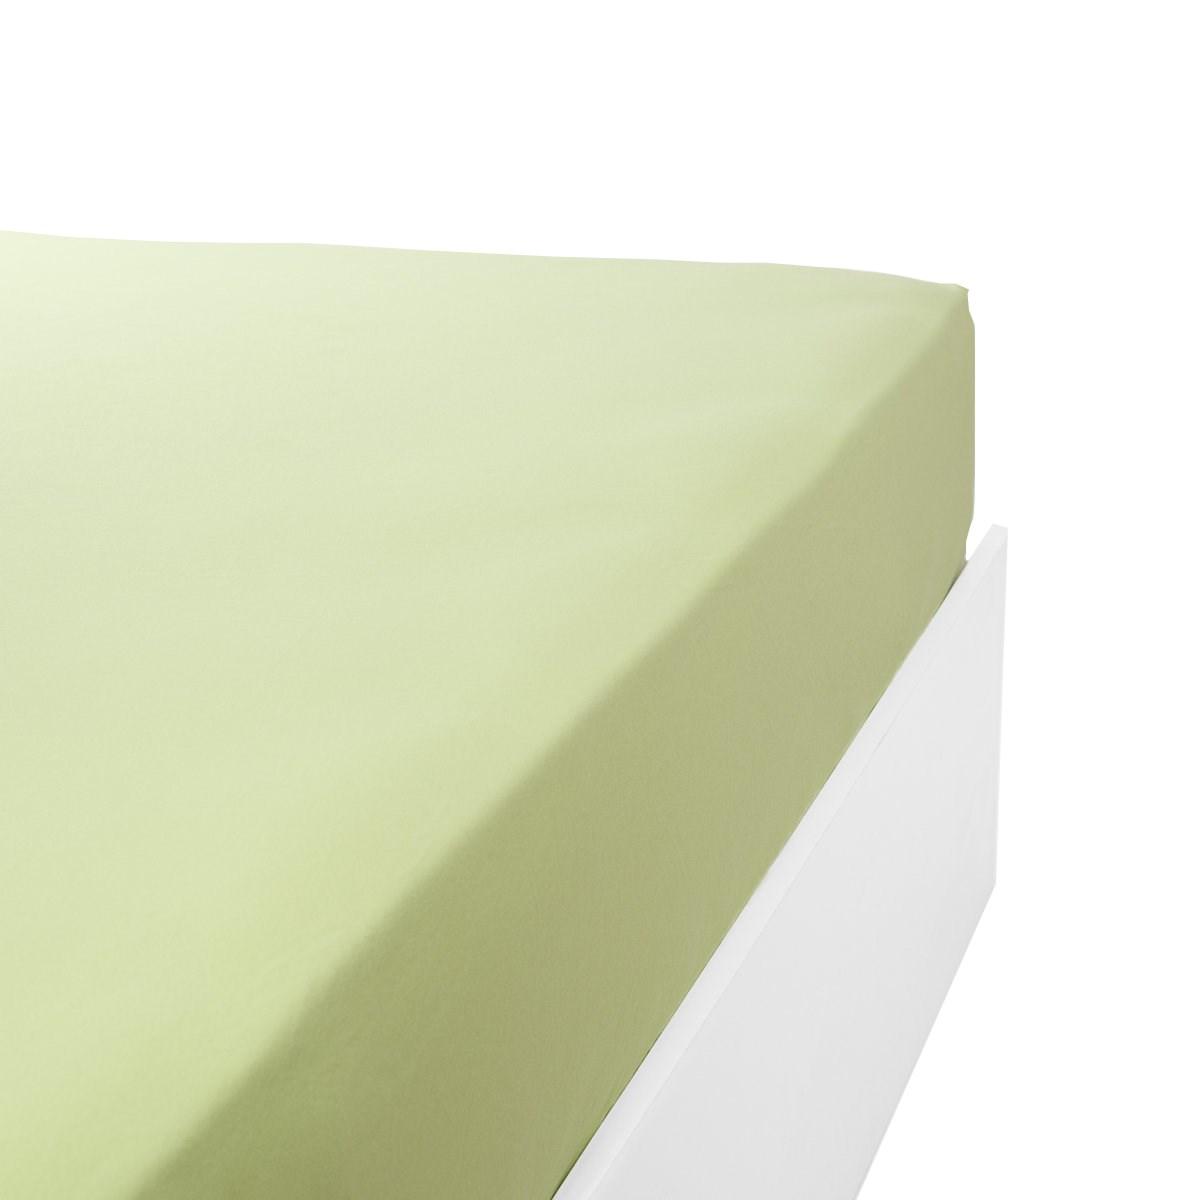 Drap housse flanelle en Molleton Vert anis 90x190 cm